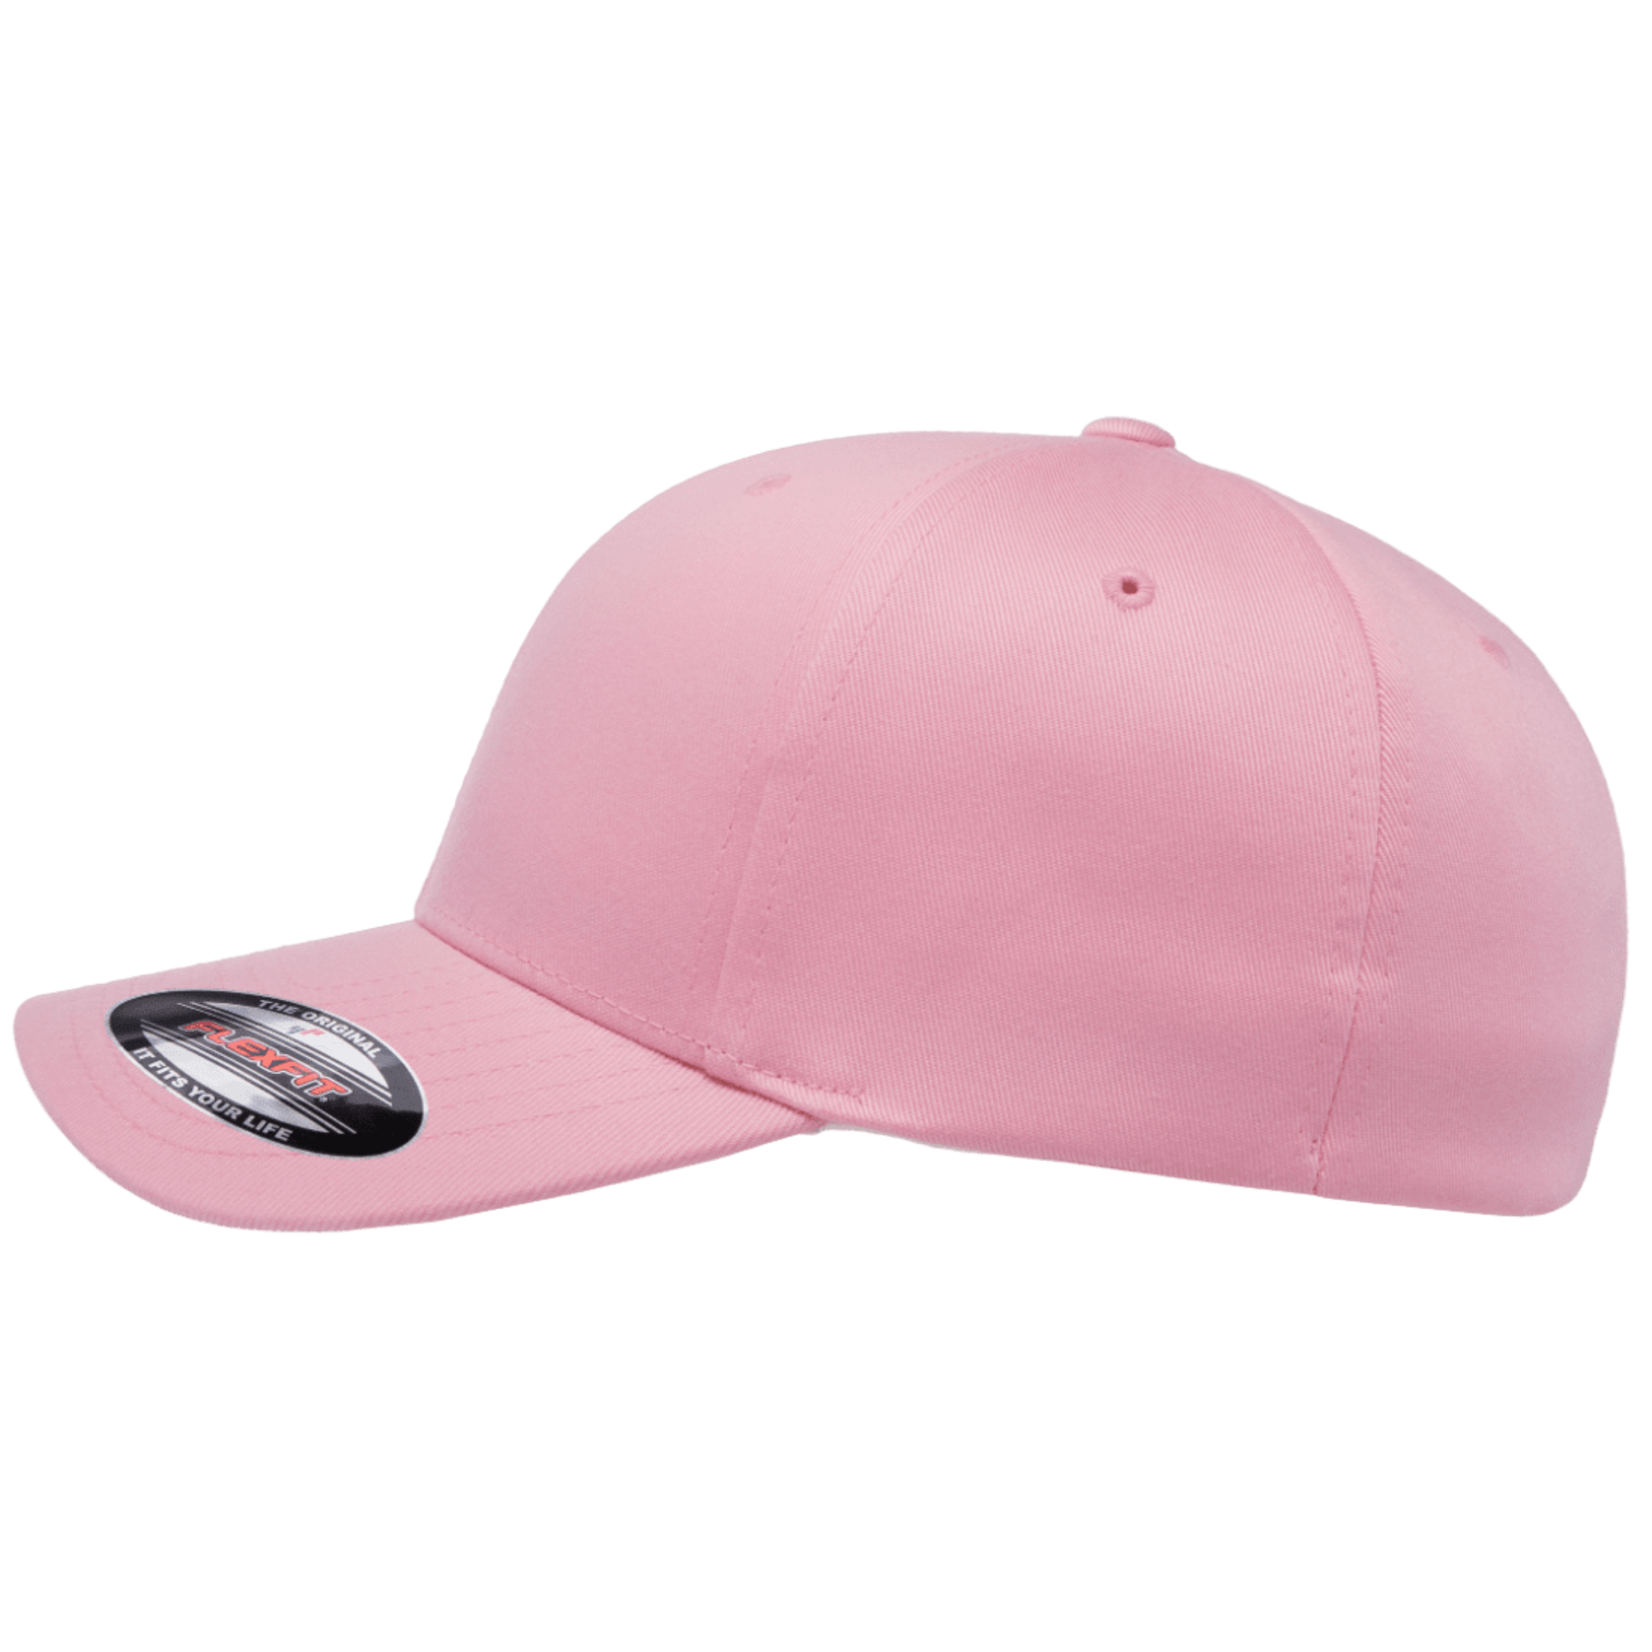 Flexfit Flexfit 6277 Classic Ballcap - Pink